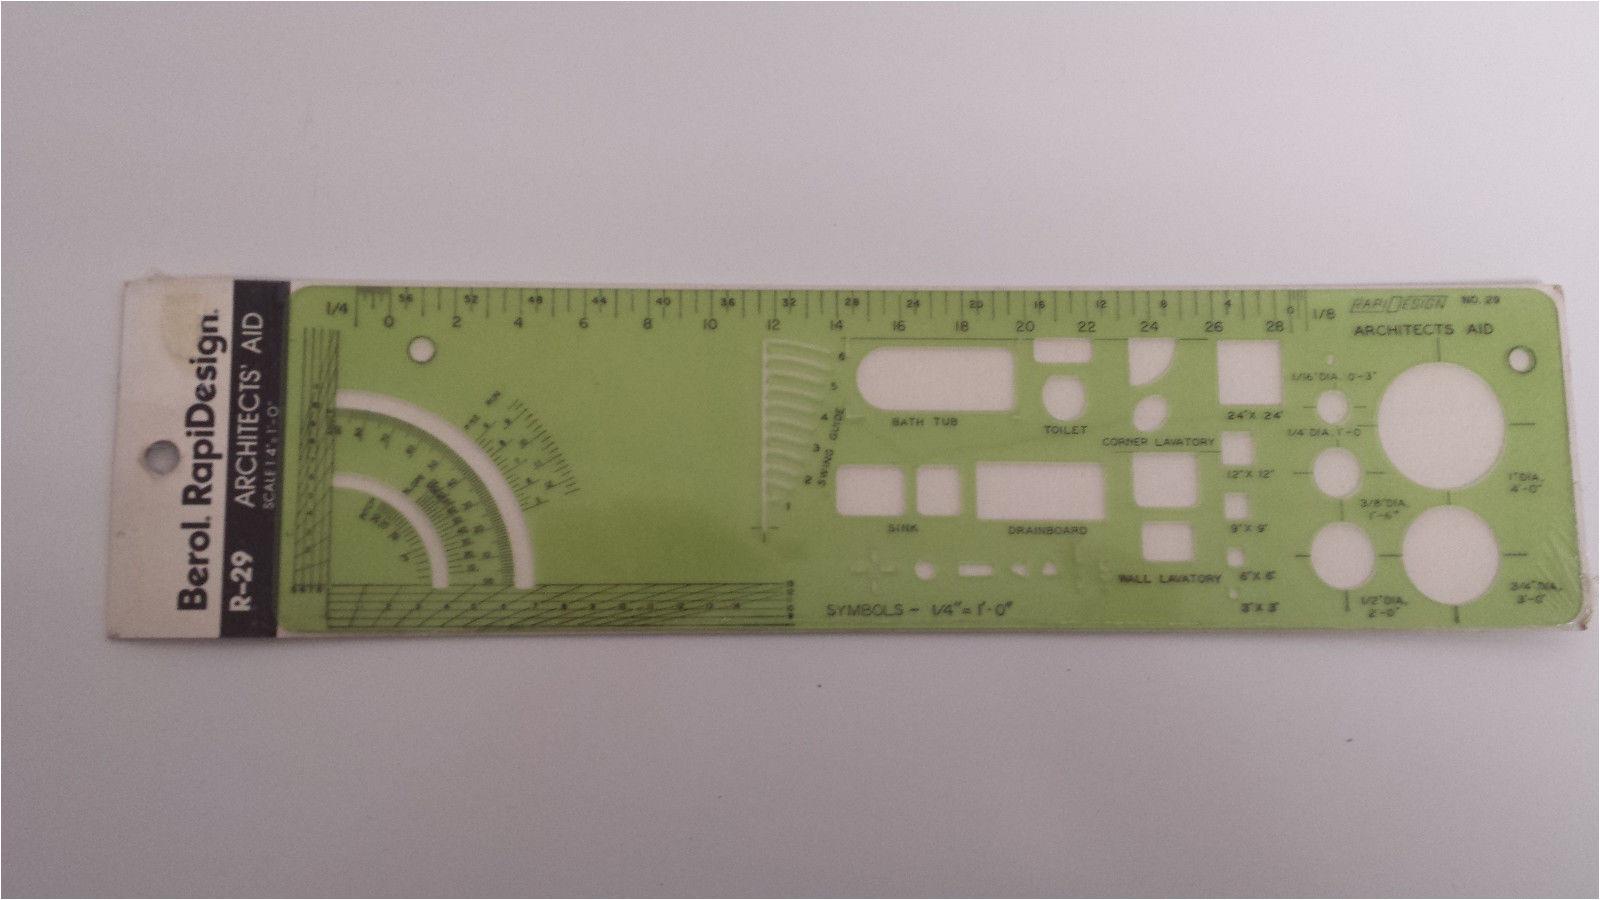 Berol Rapidesign Templates Nos Berol Rapidesign Template R 29 Architects 39 Aid